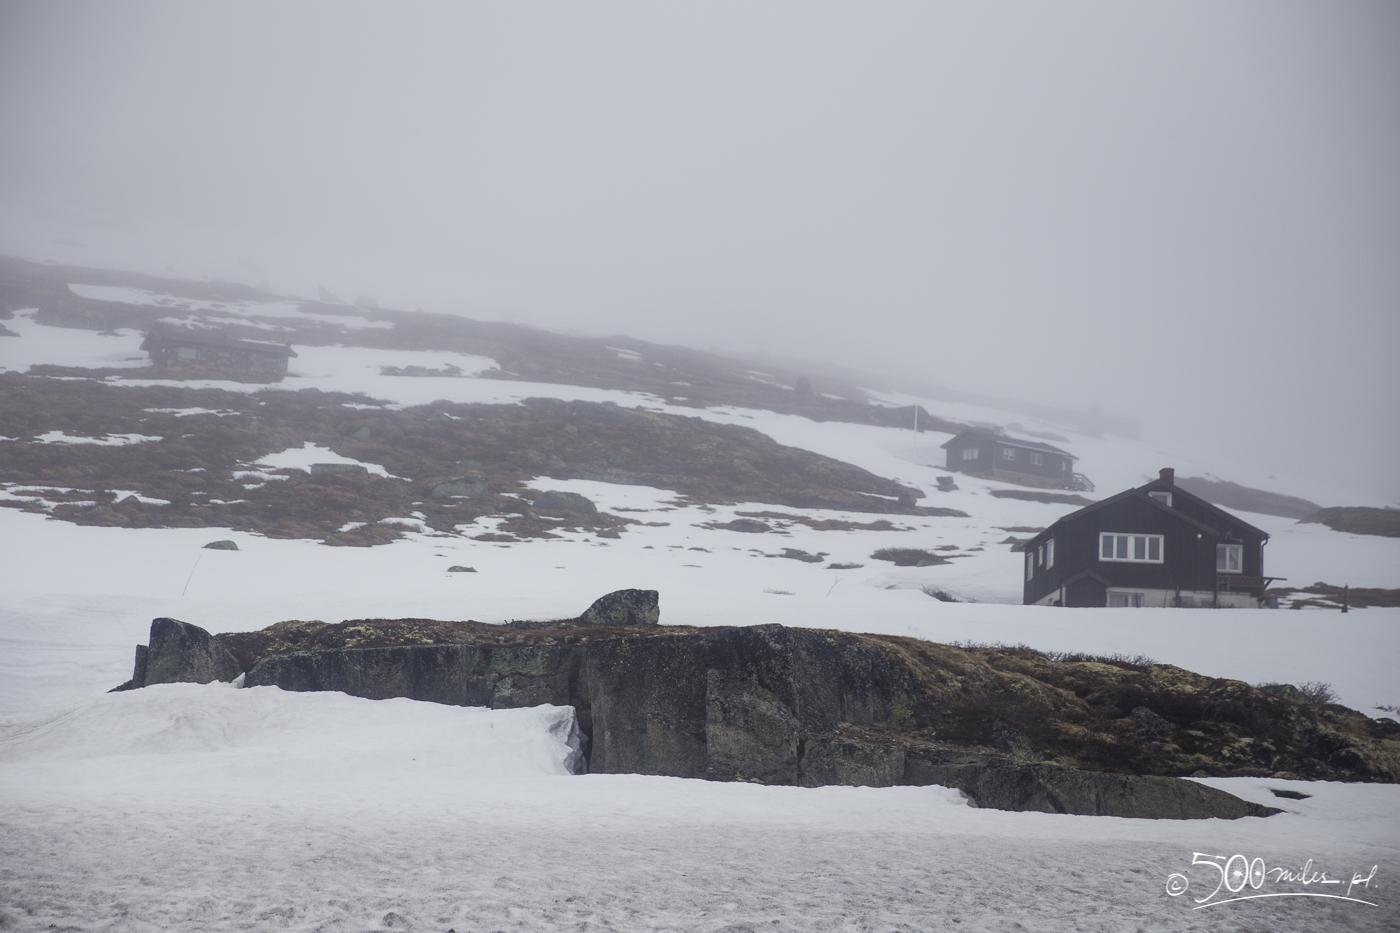 Oslo-Bergen train ride - snowy and foggy view